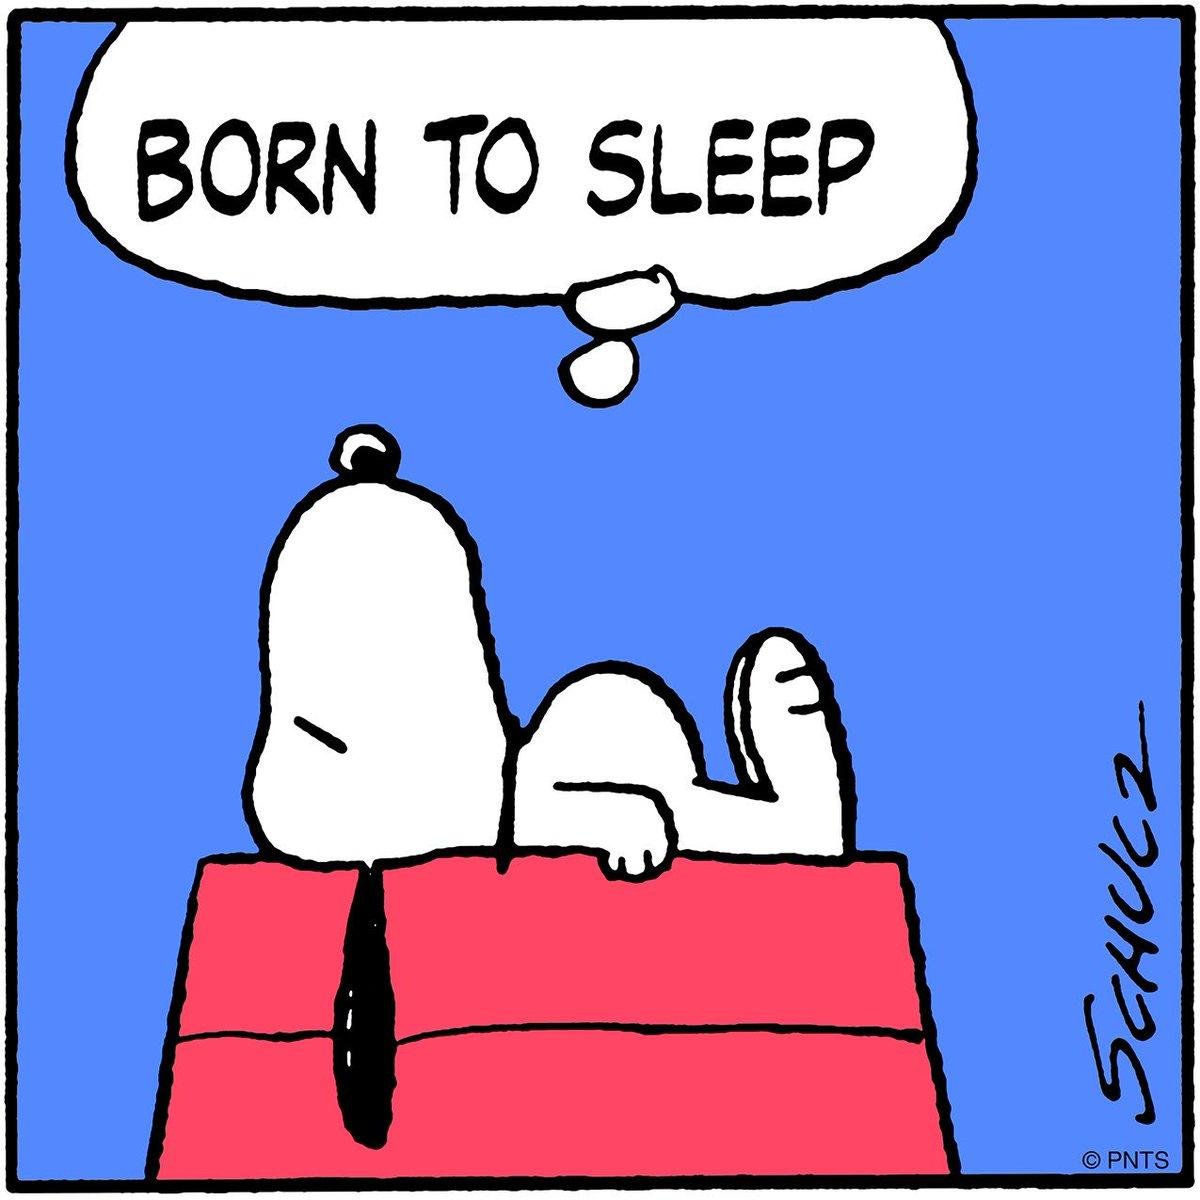 peanuts on twitter born to sleep